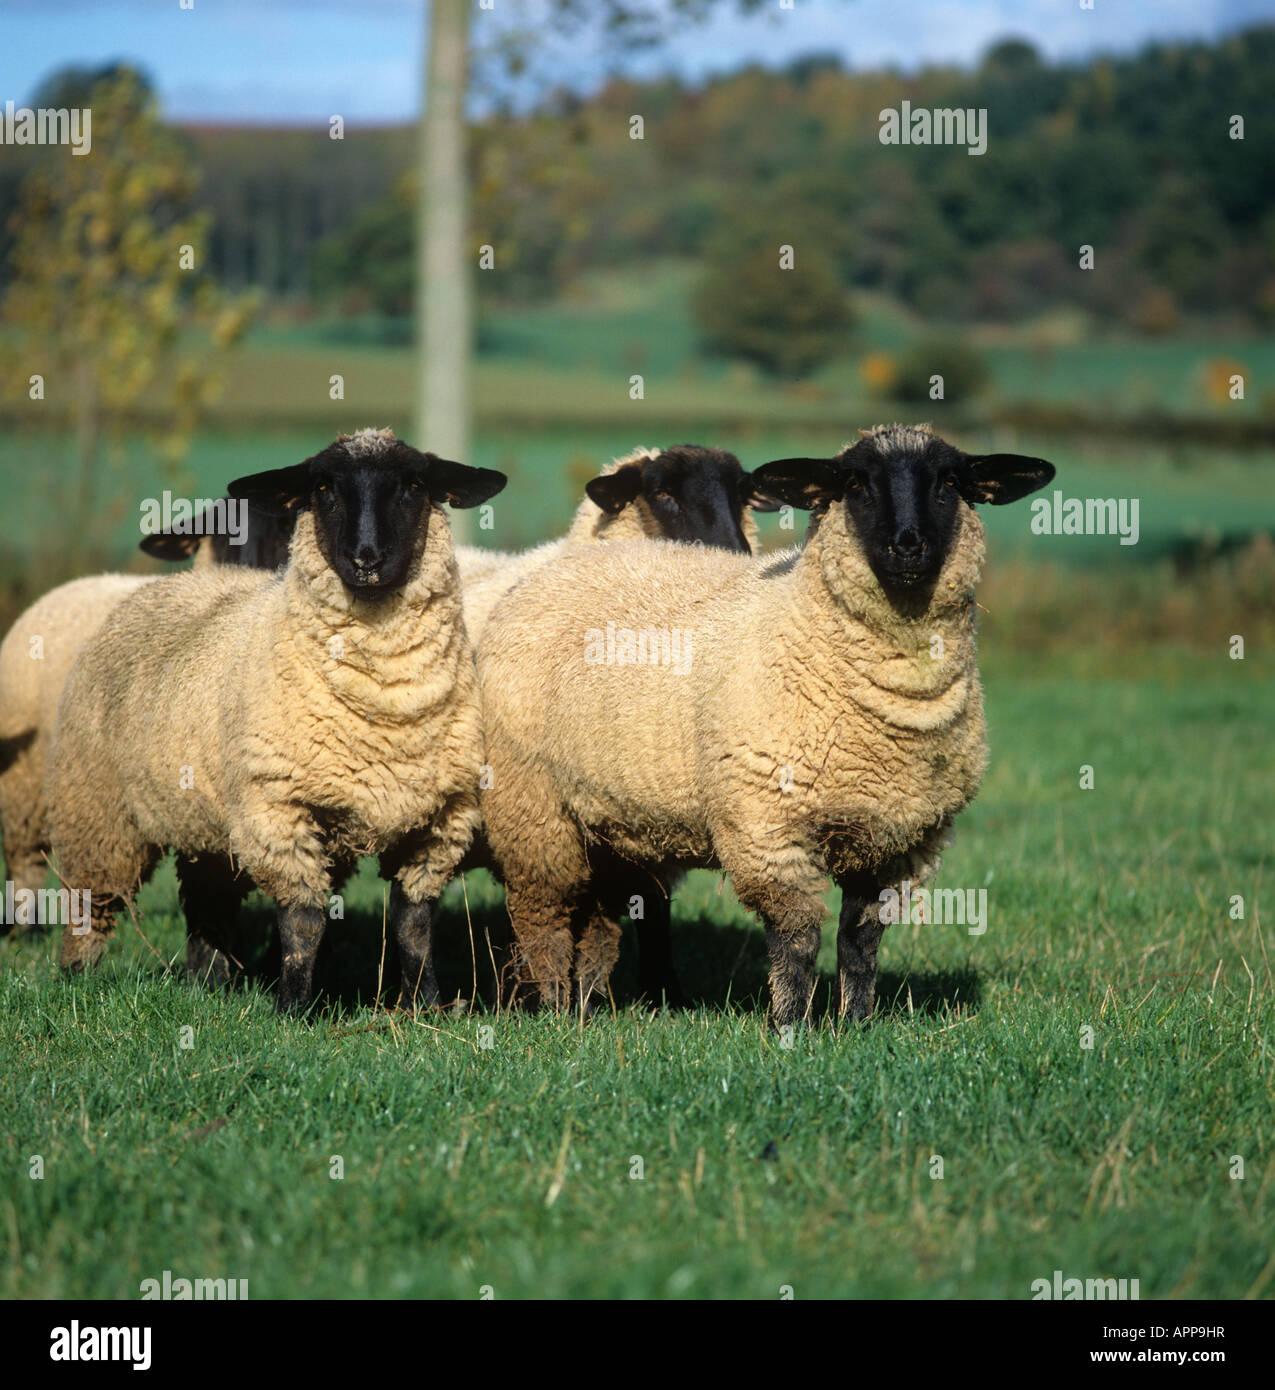 Suffolk ewe lambs on autumn pasture Herefordshire - Stock Image